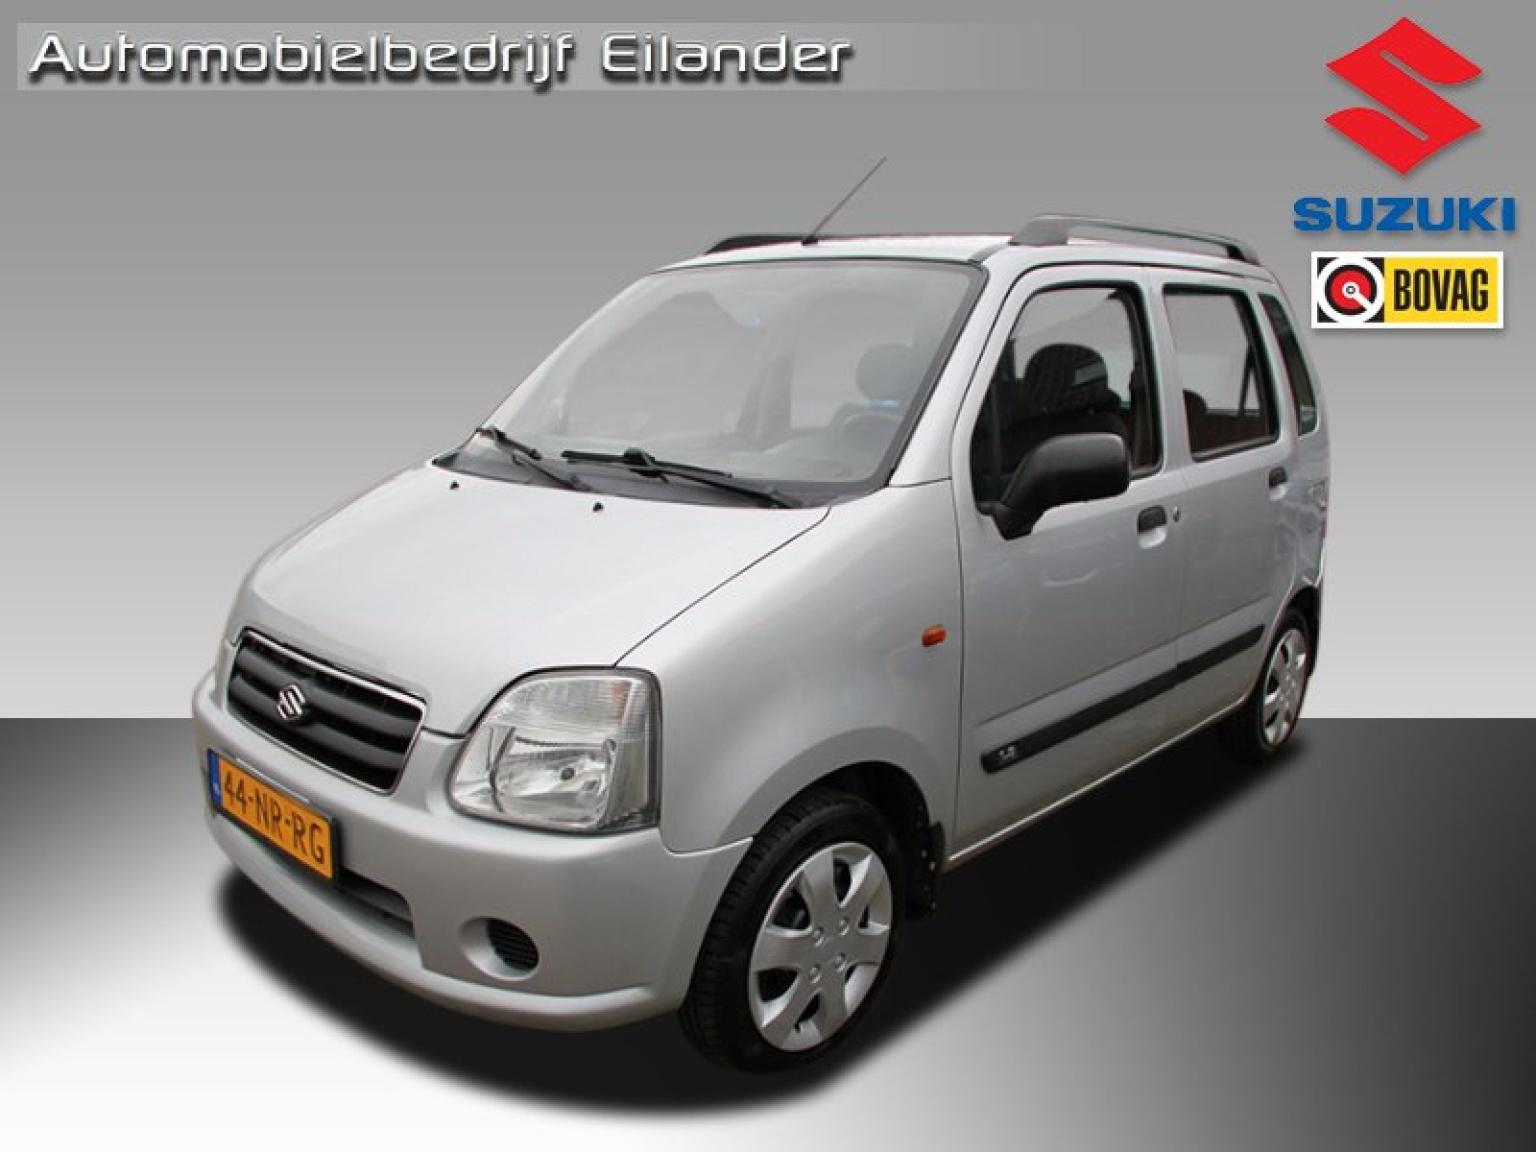 Suzuki-Wagon R+-0